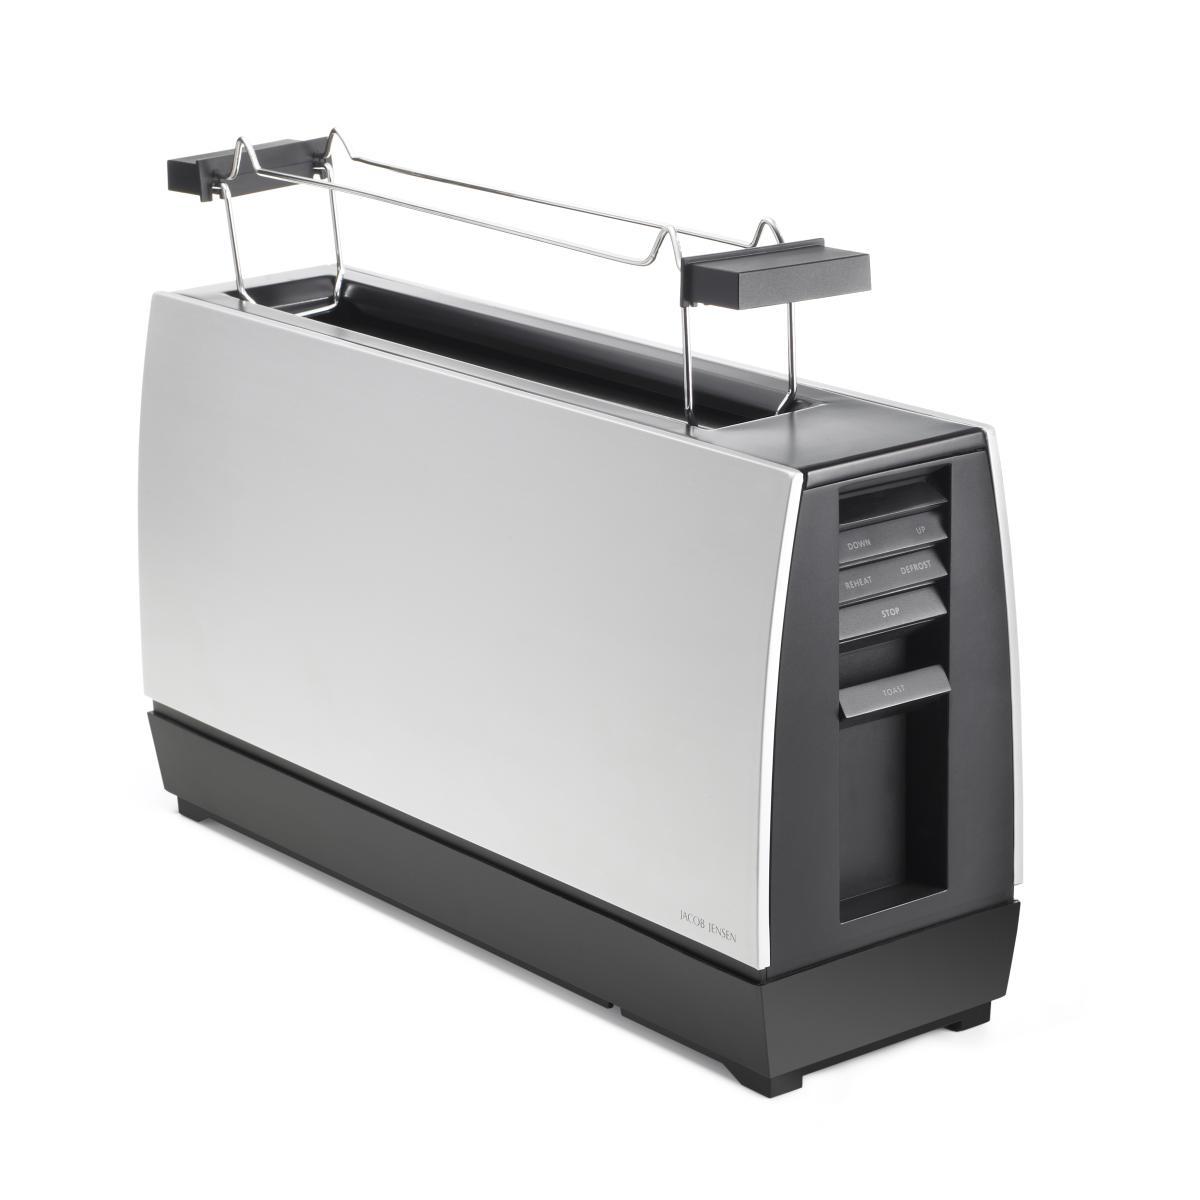 ONE SLOT Toaster Jacob Jensen